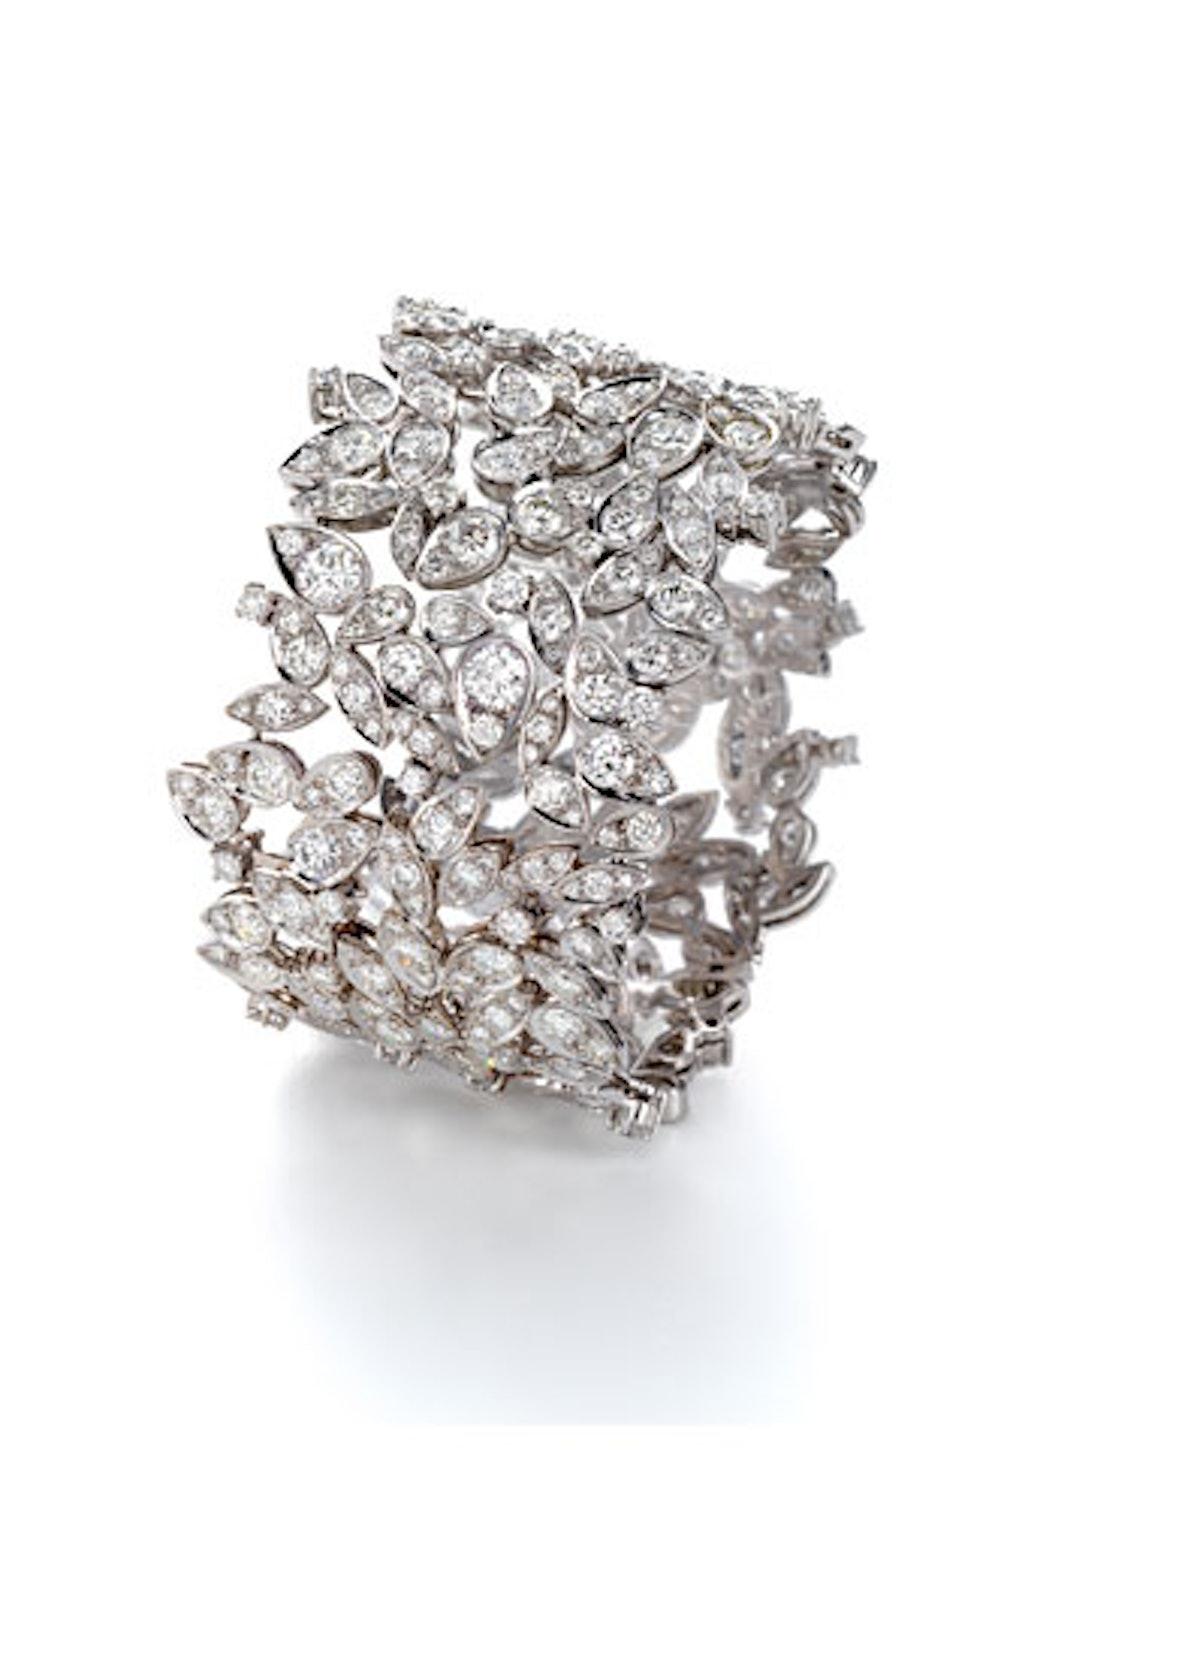 acss-golden-globes-jewelry-03-v.jpg